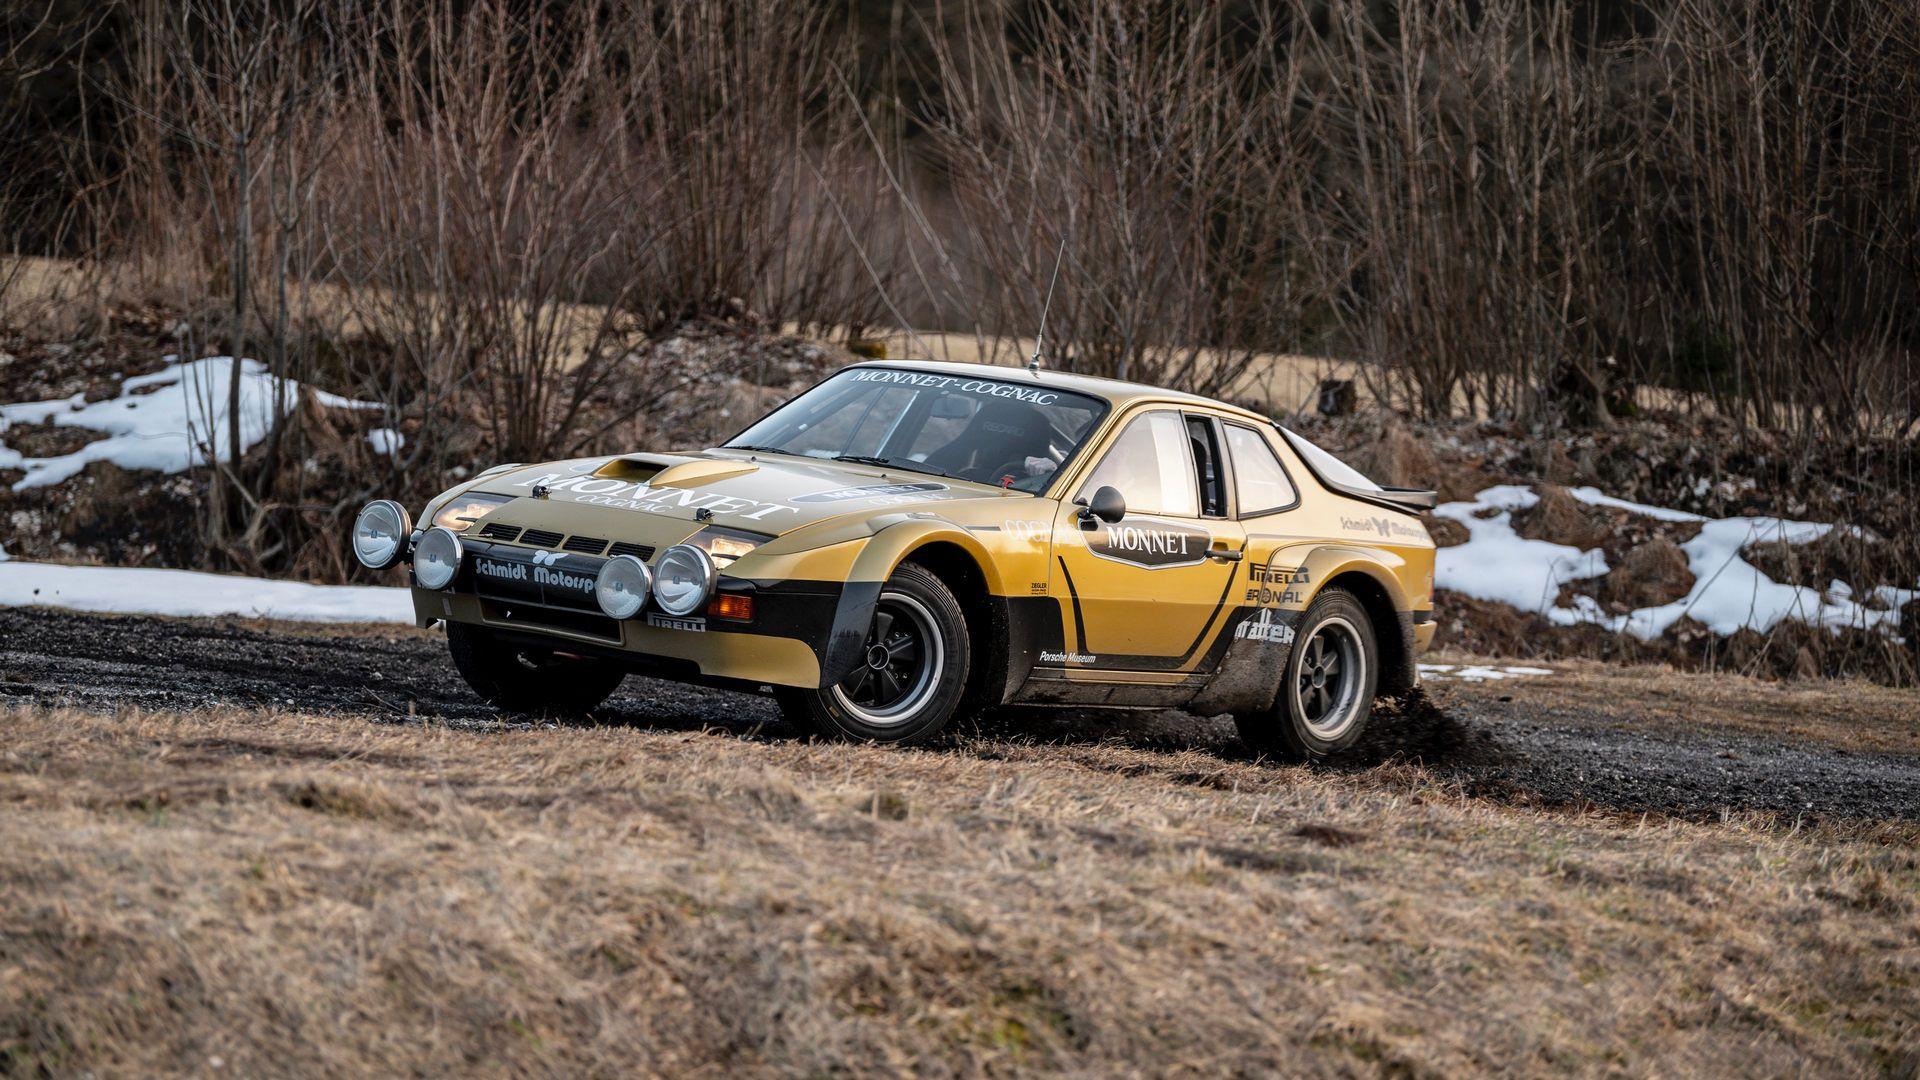 Porsche-924-Carrera-GTS-rally-car-Walter-Rohrl-1